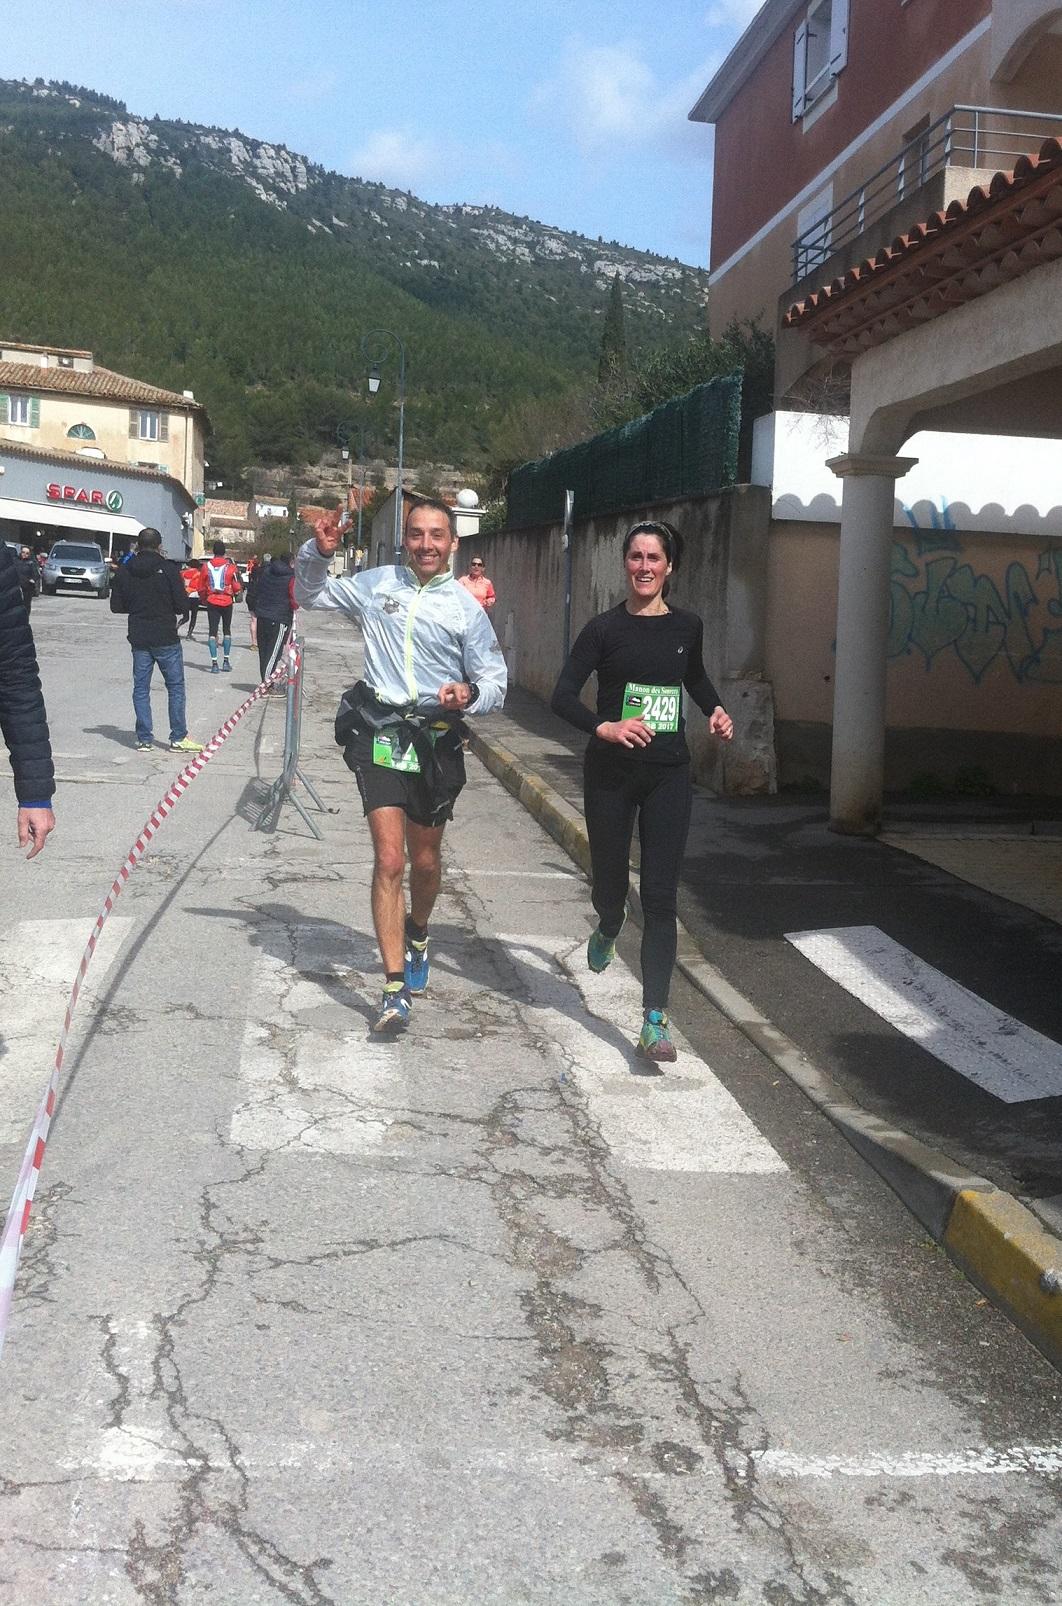 25-L'arrivée de Seb' G. & Marisol